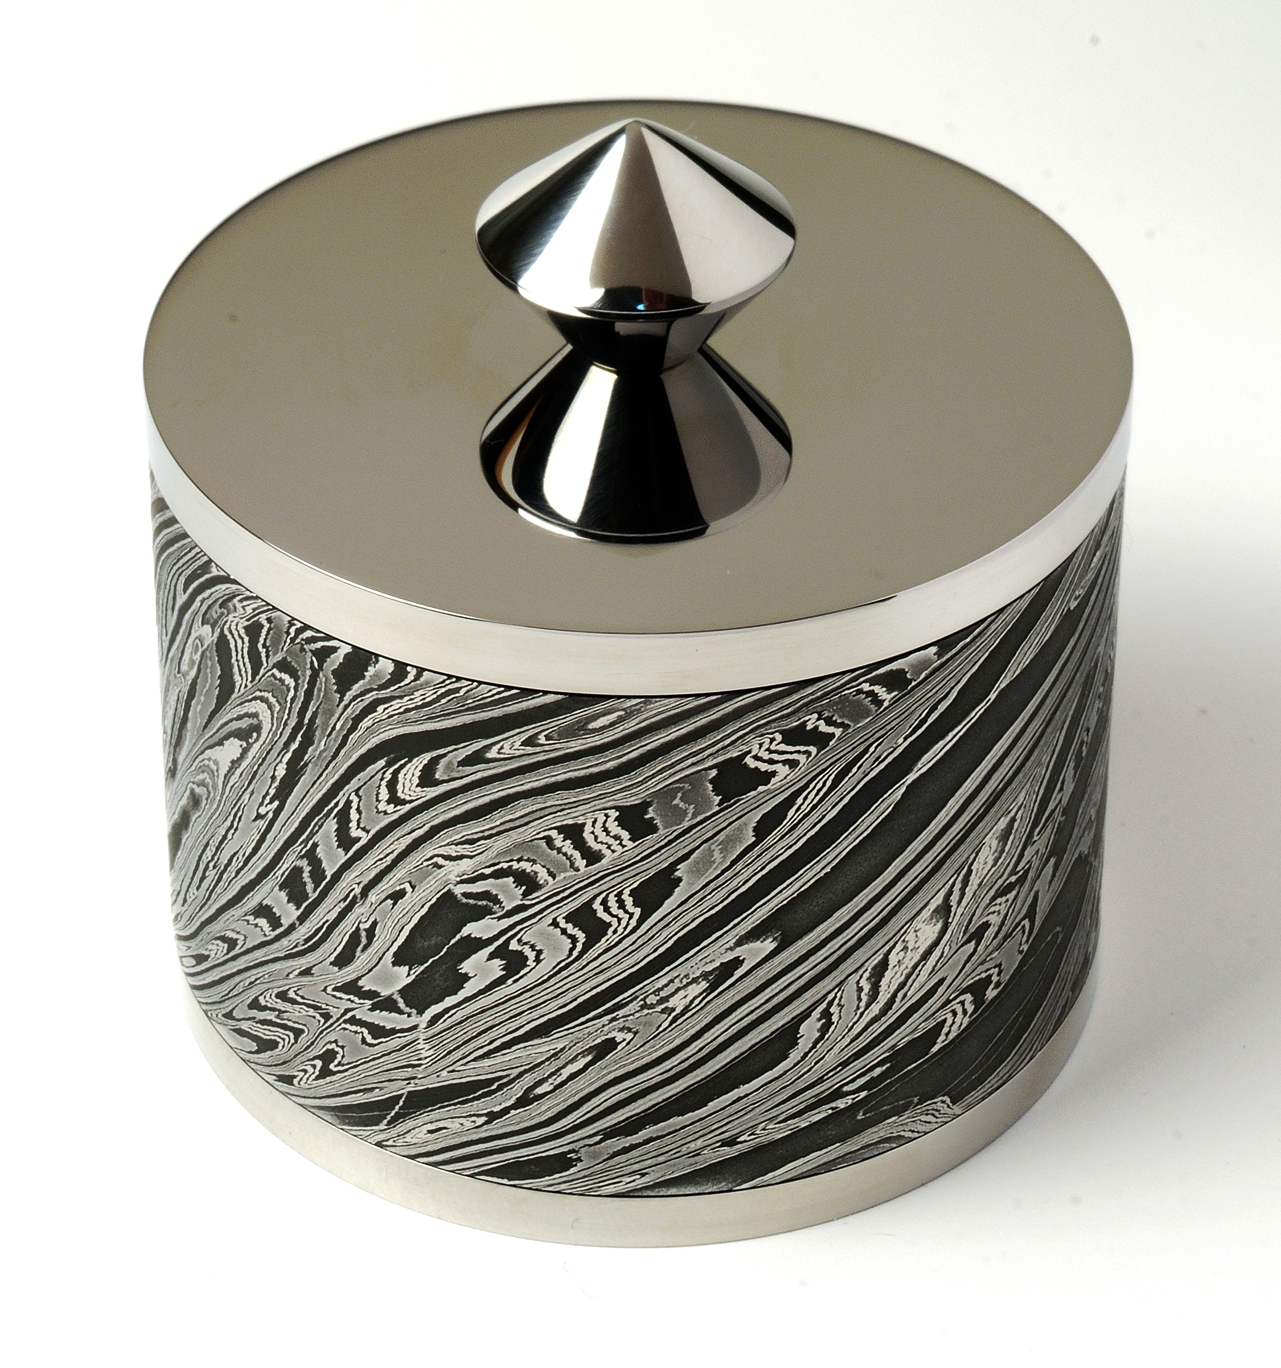 Lidded trinket box by Mick Maxen